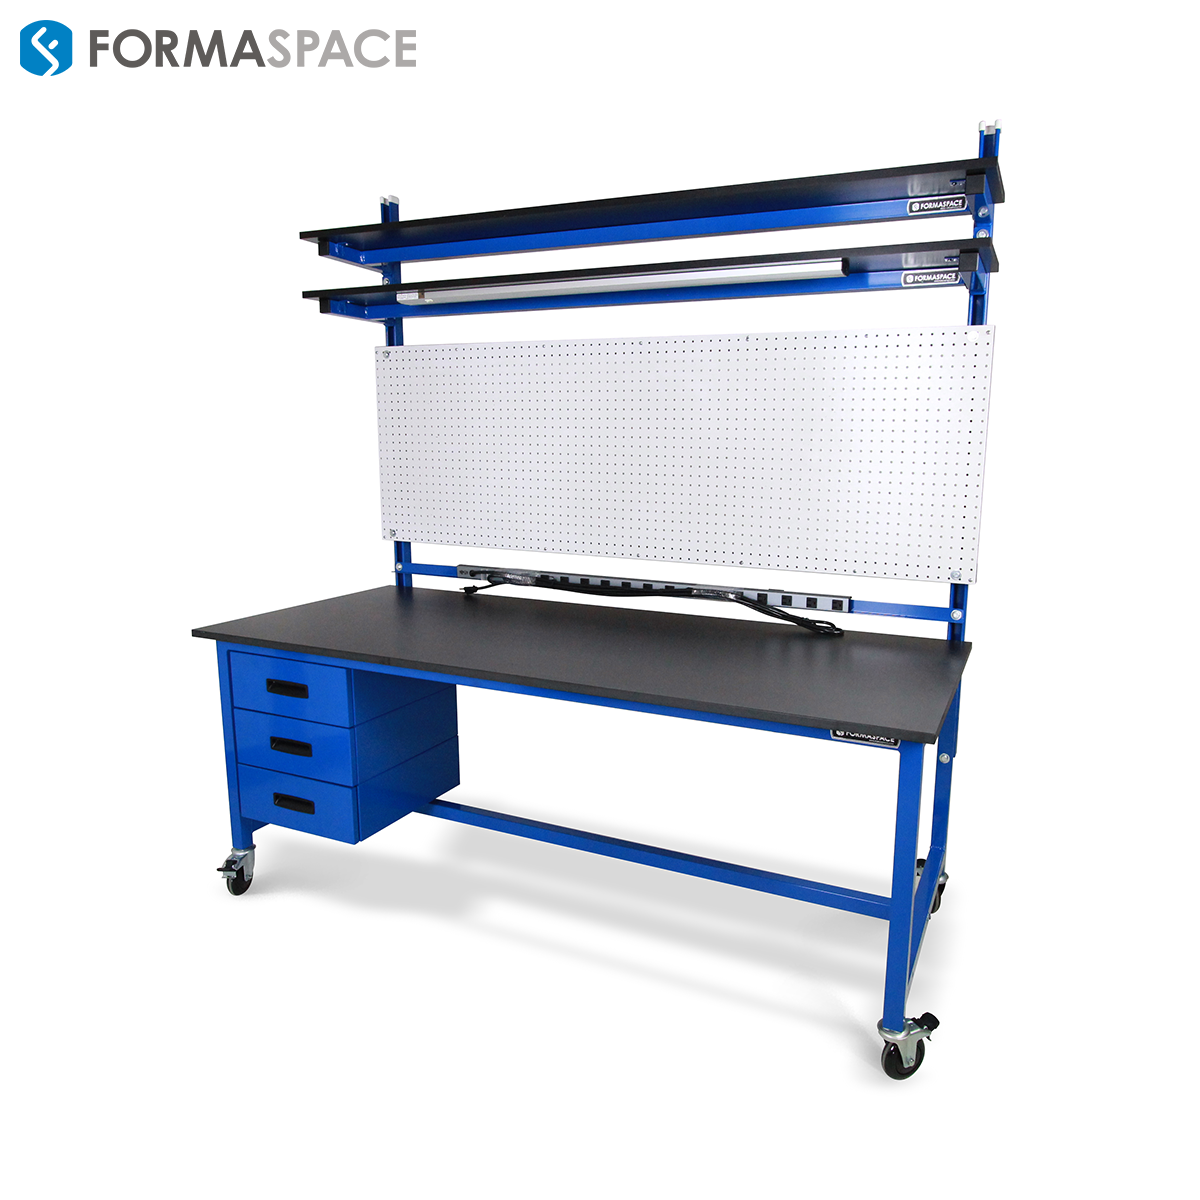 Tall pegboard workbench for tool organization